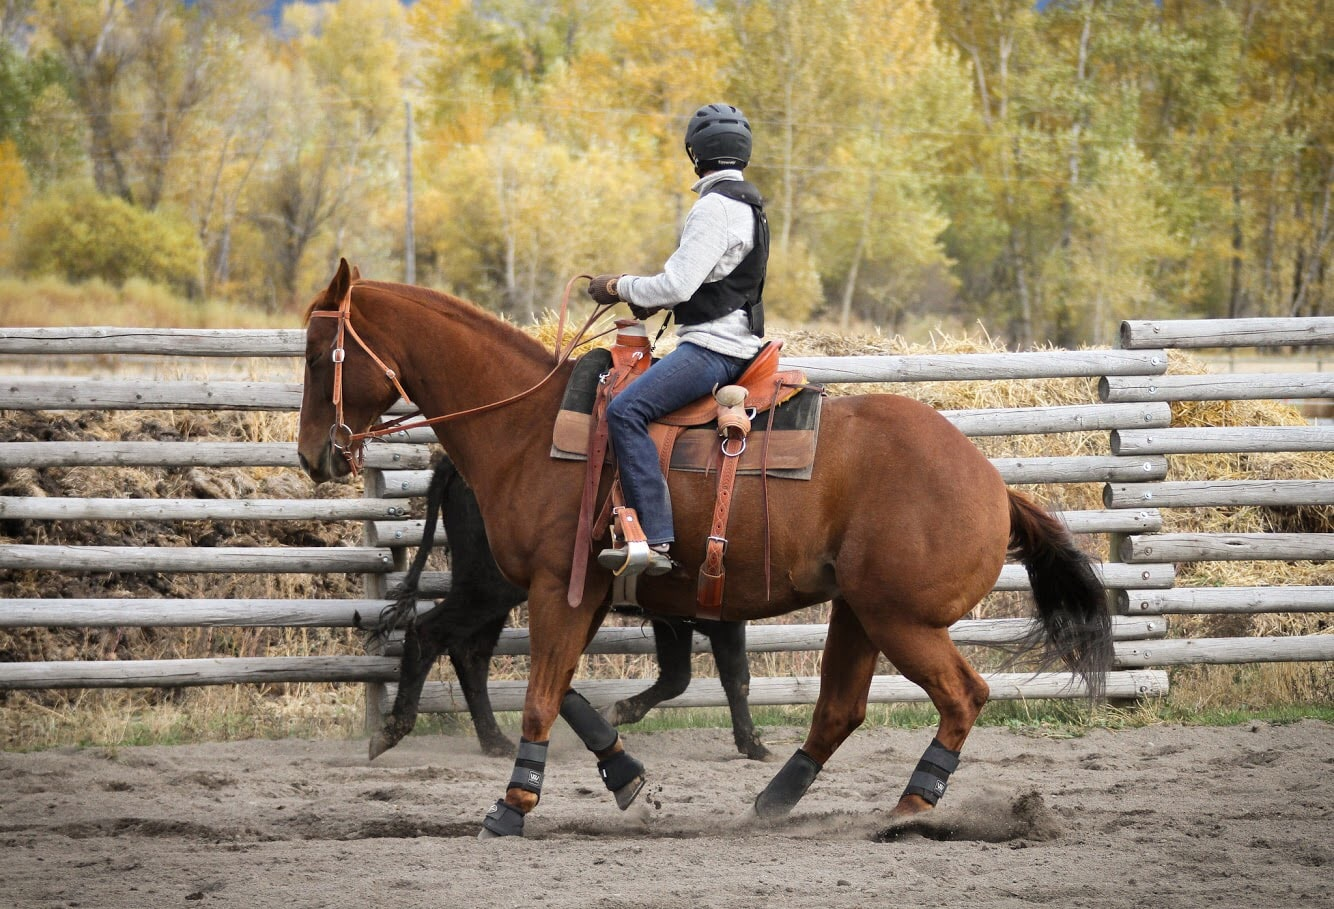 horse-riding-nerves-tips